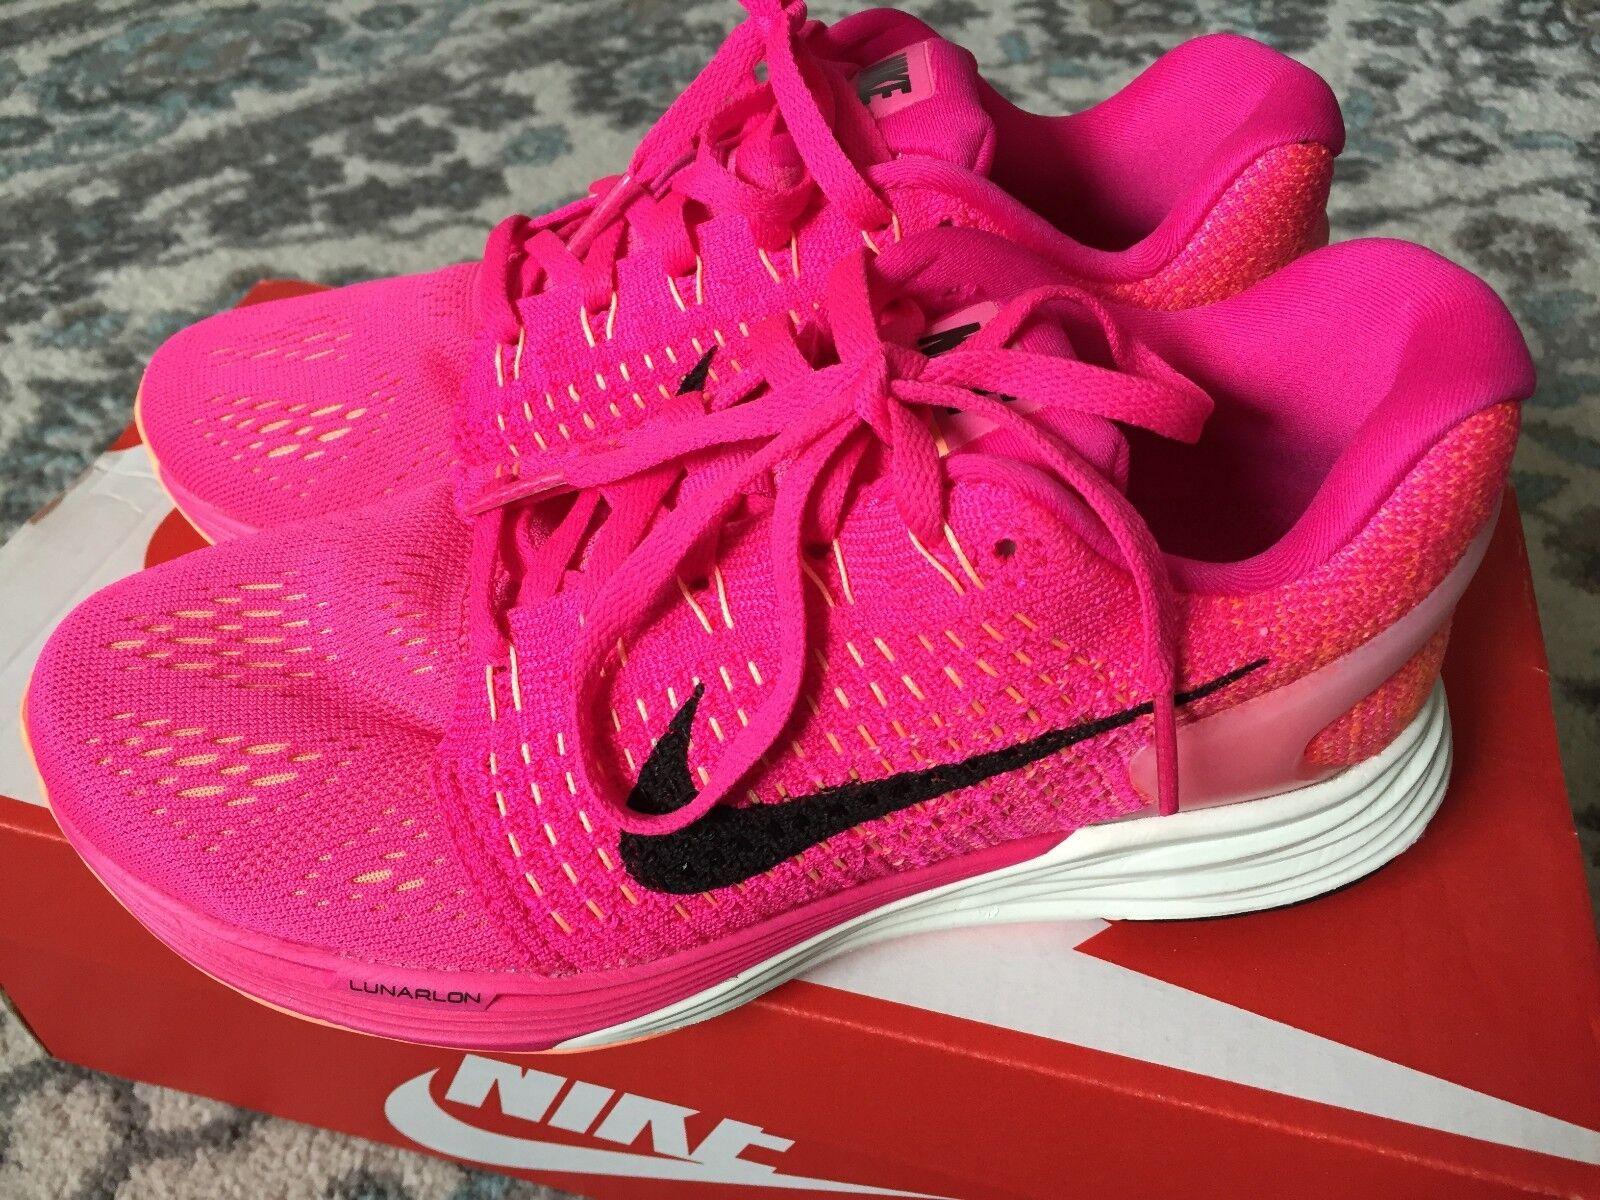 Nike Lunarglide 7 Women's 747356-600 Running Shoes Comfortable Great discount